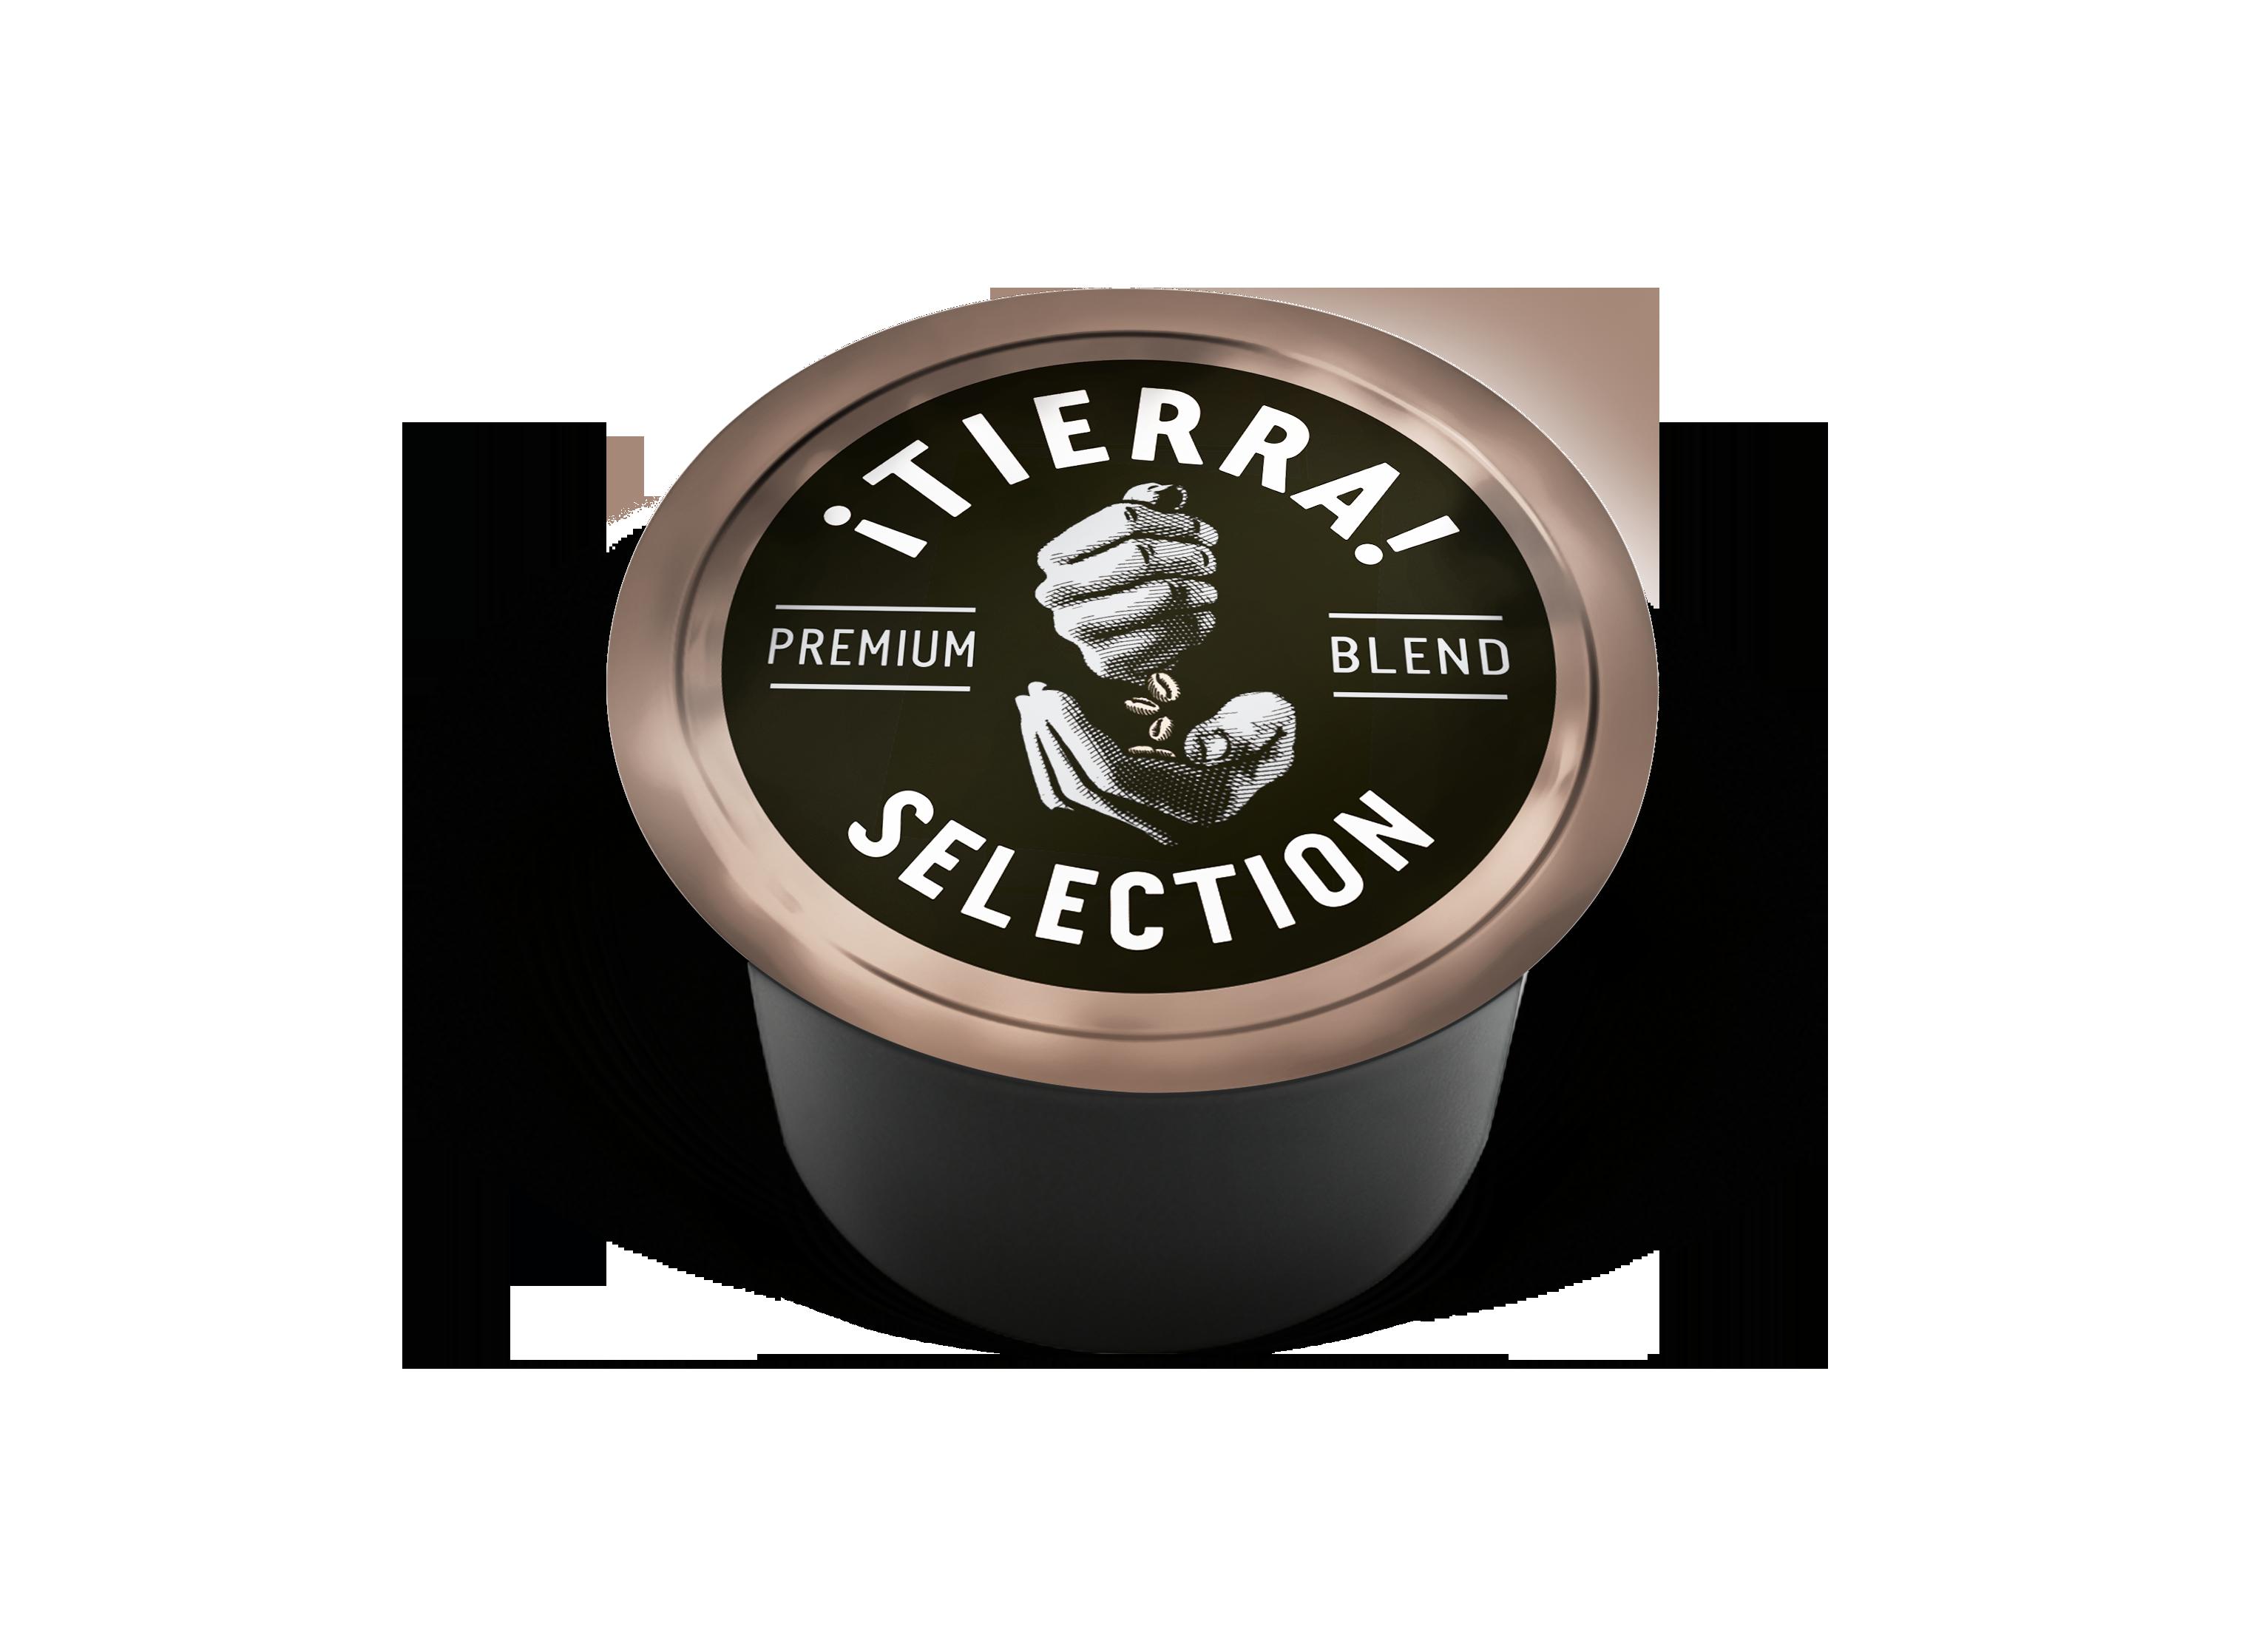 ¡Tierra! Selection